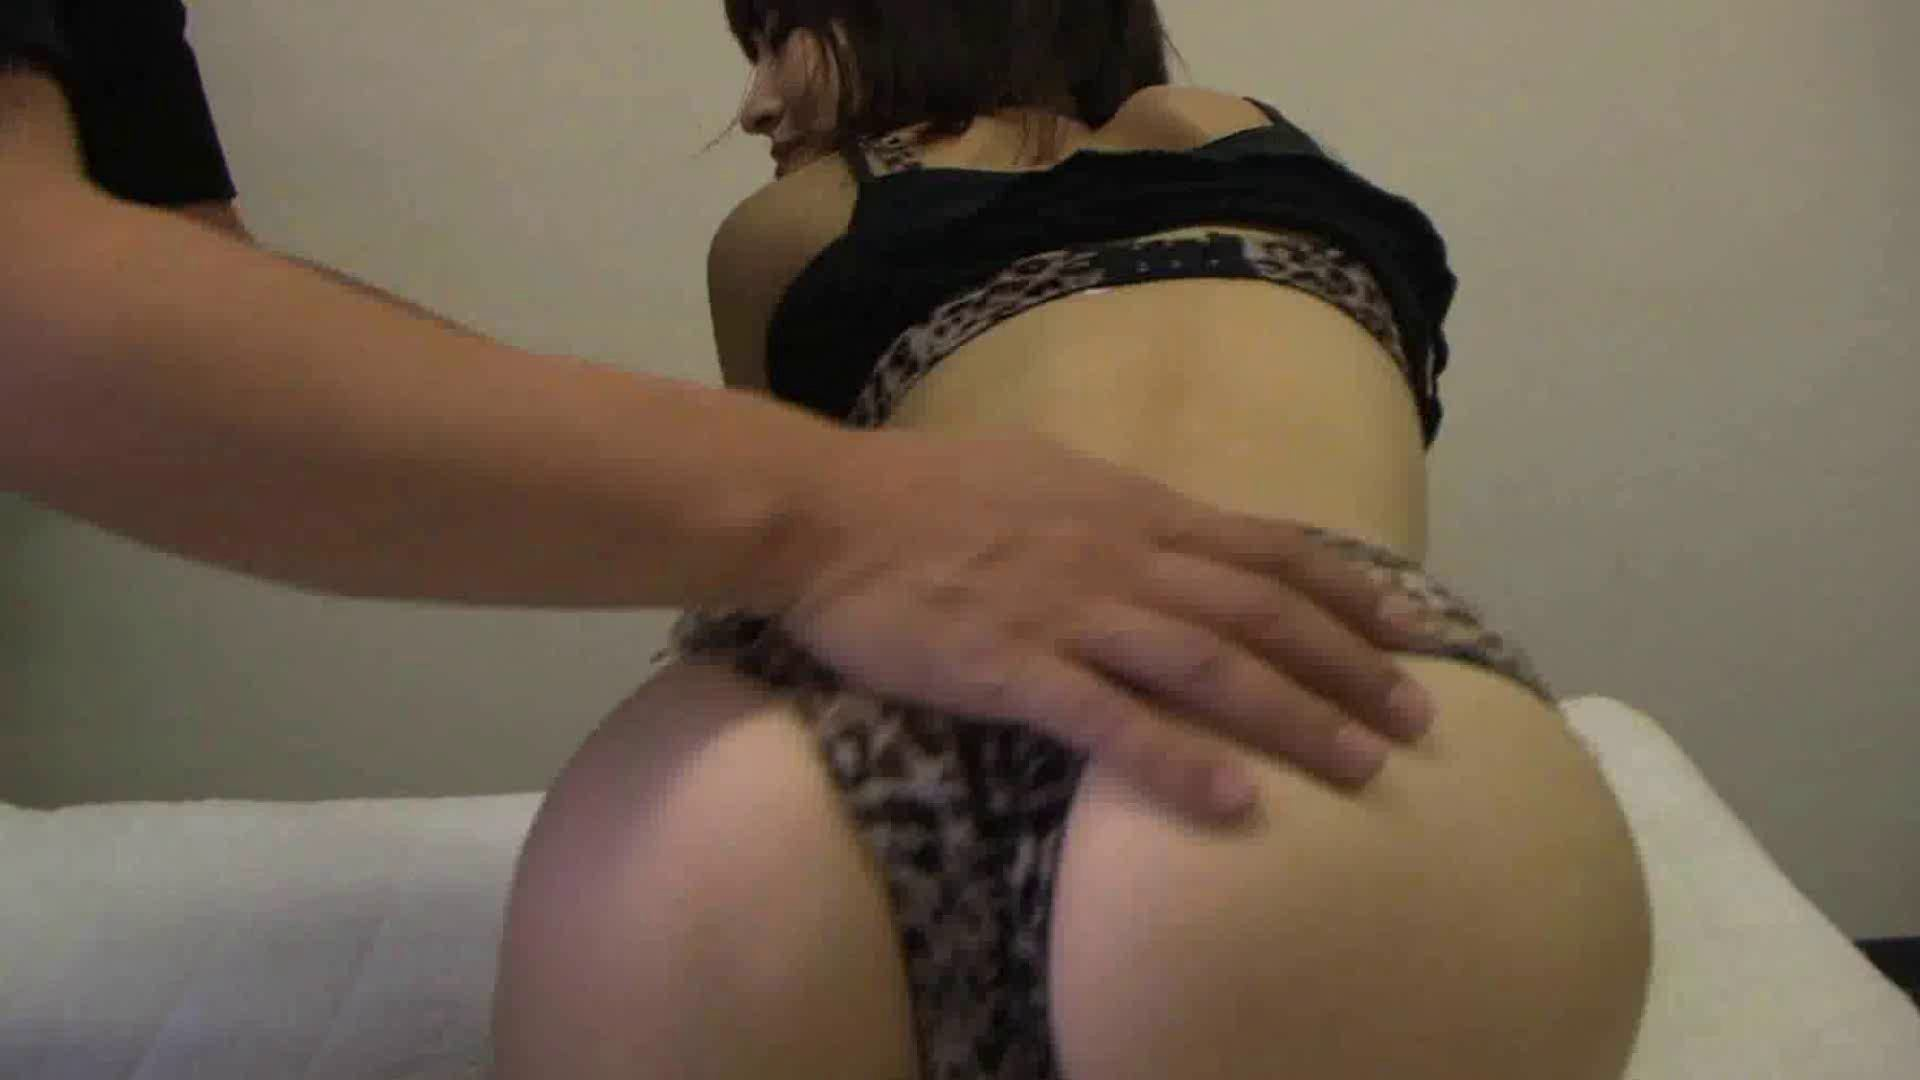 S級厳選美女ビッチガールVol.26 美女ヌード  72画像 28